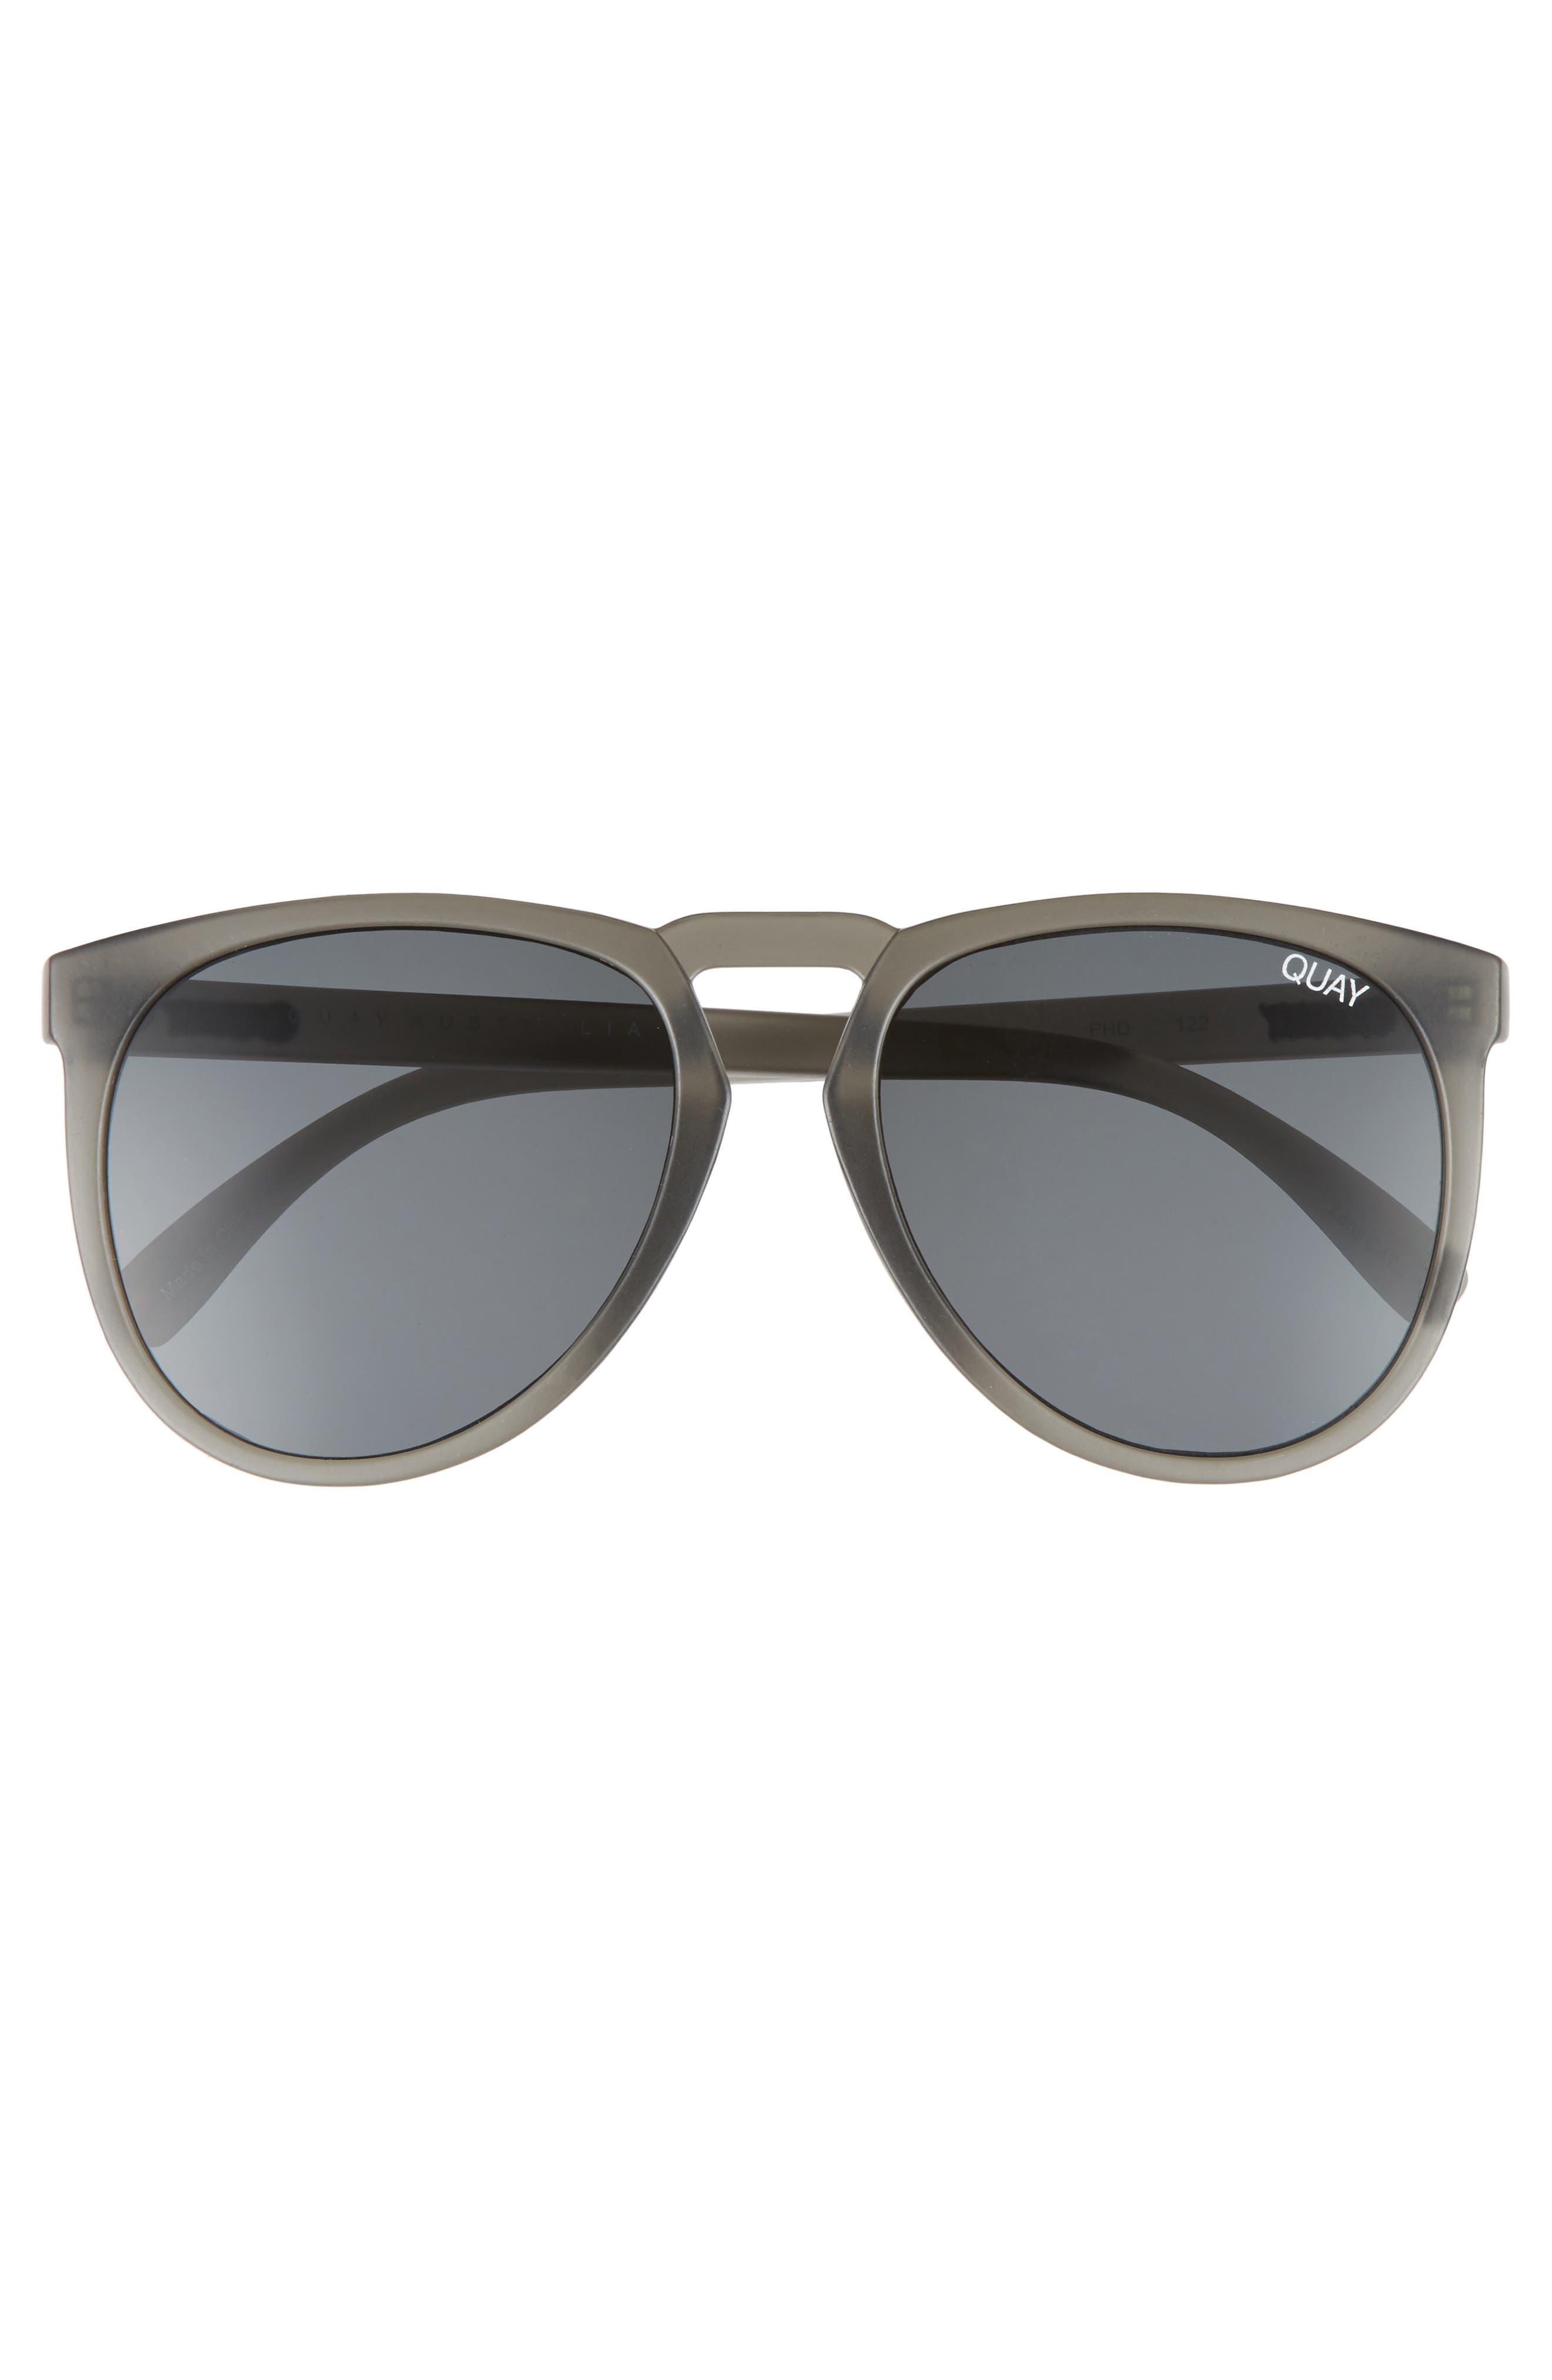 PhD 65mm Sunglasses,                             Alternate thumbnail 2, color,                             GREY/SMOKE